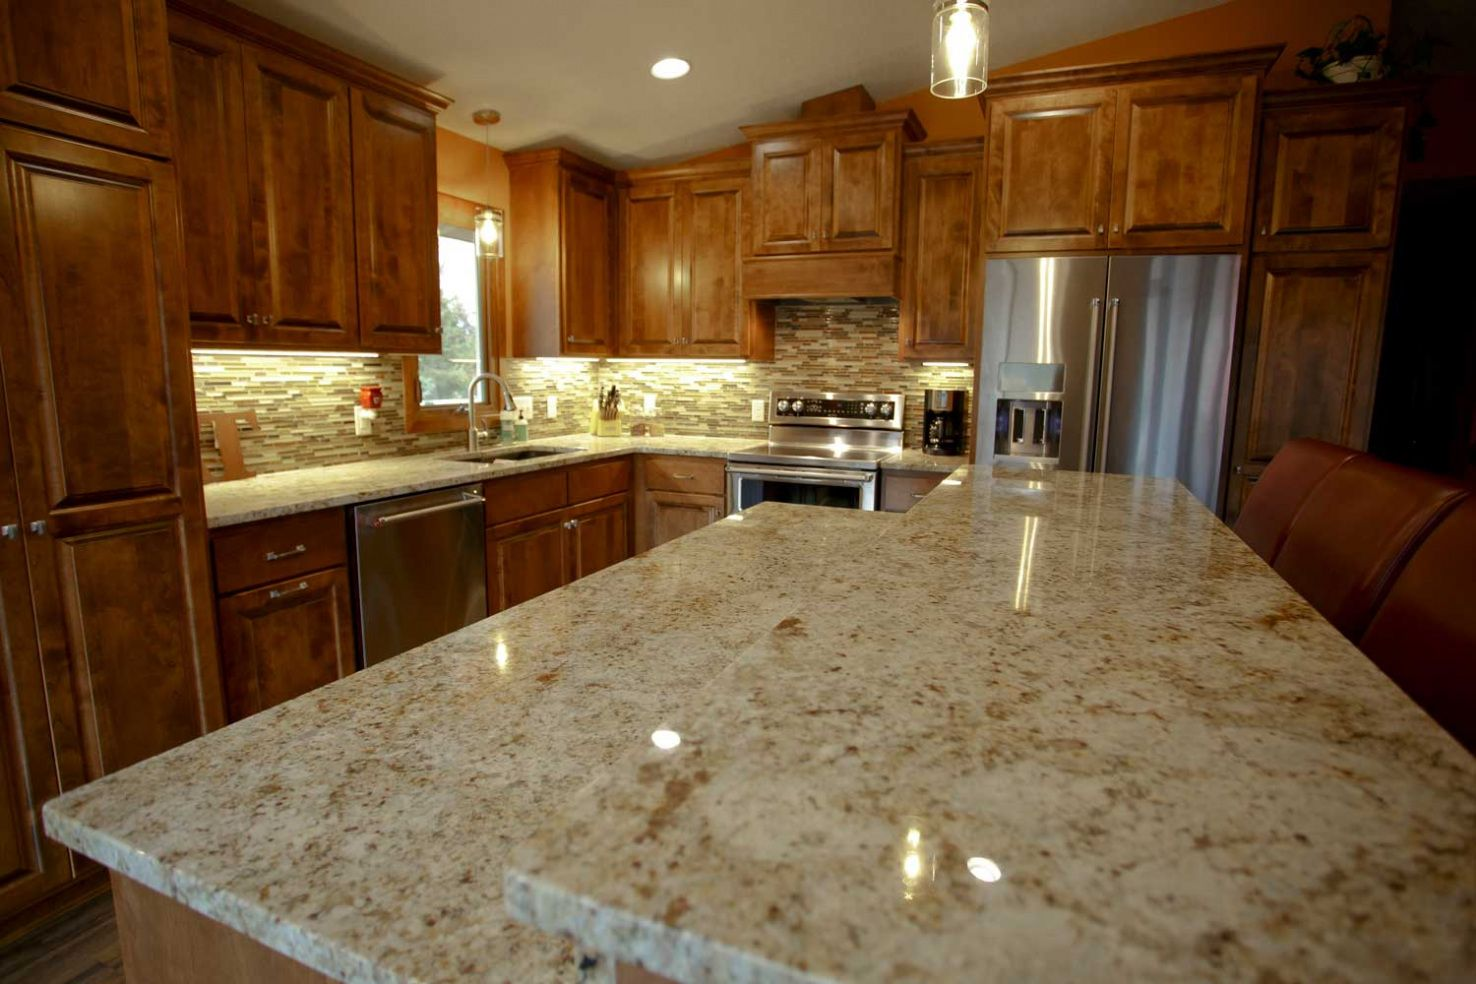 2019 Granite Countertops Albertville Mn   Kitchen Cabinets Countertops  Ideas Check More At Http:/